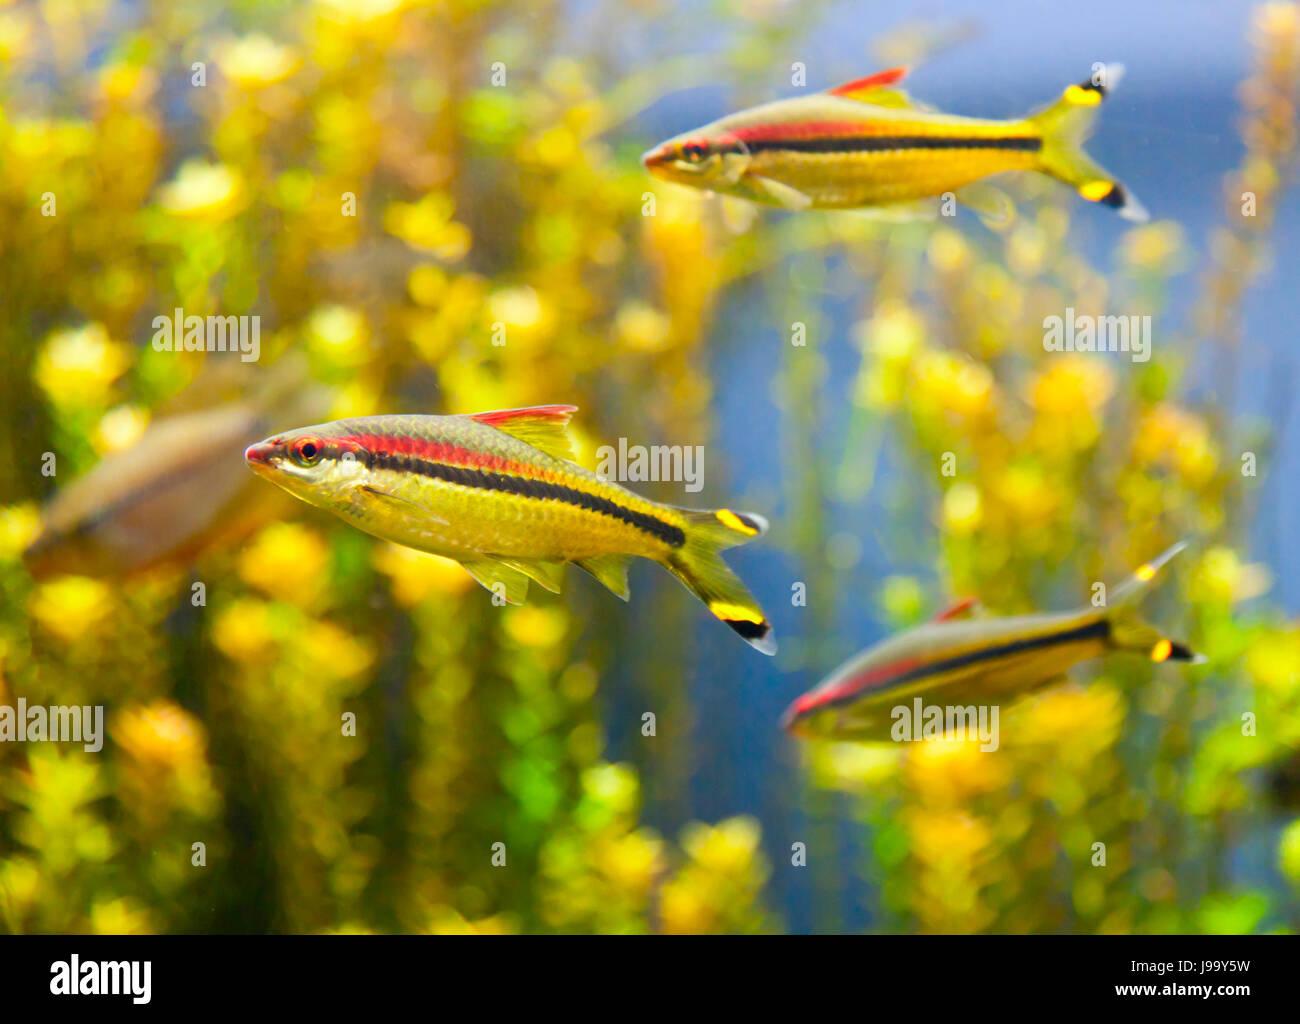 fish, underwater, tropical, swarm, school, navy, marine, salt water, sea, Stock Photo